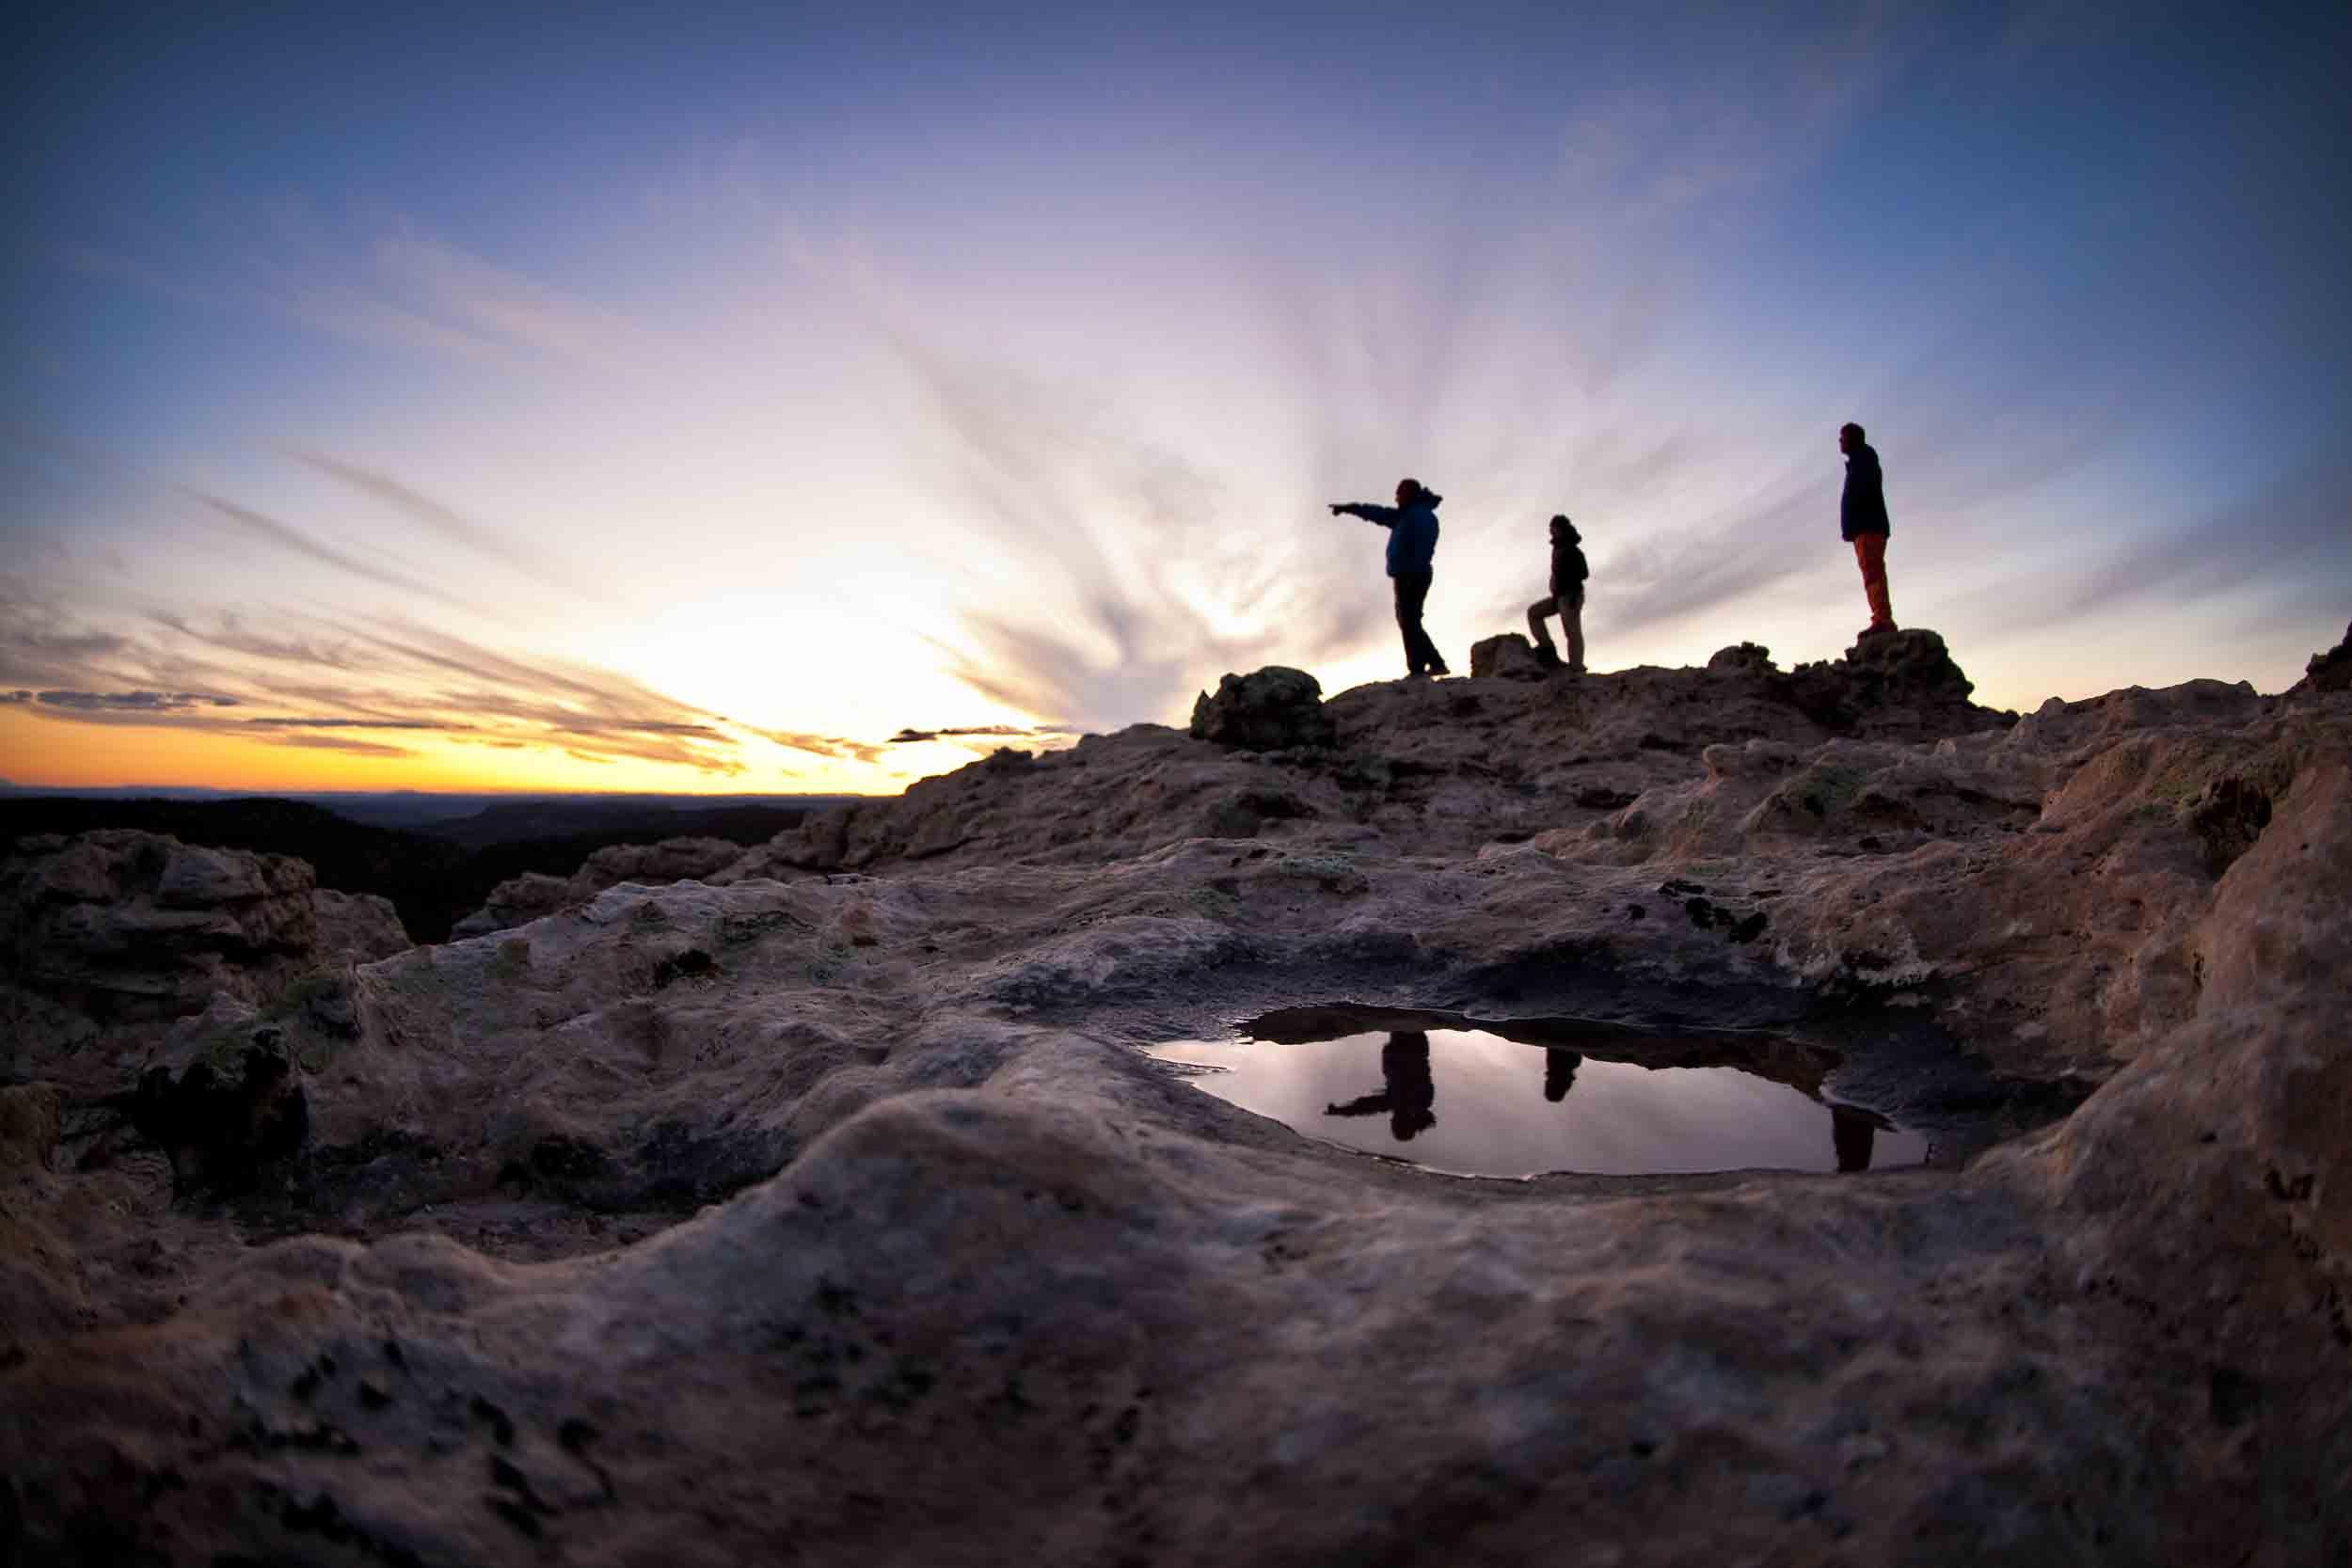 southeast utah sunrise silhouette open sky wilderness therapy